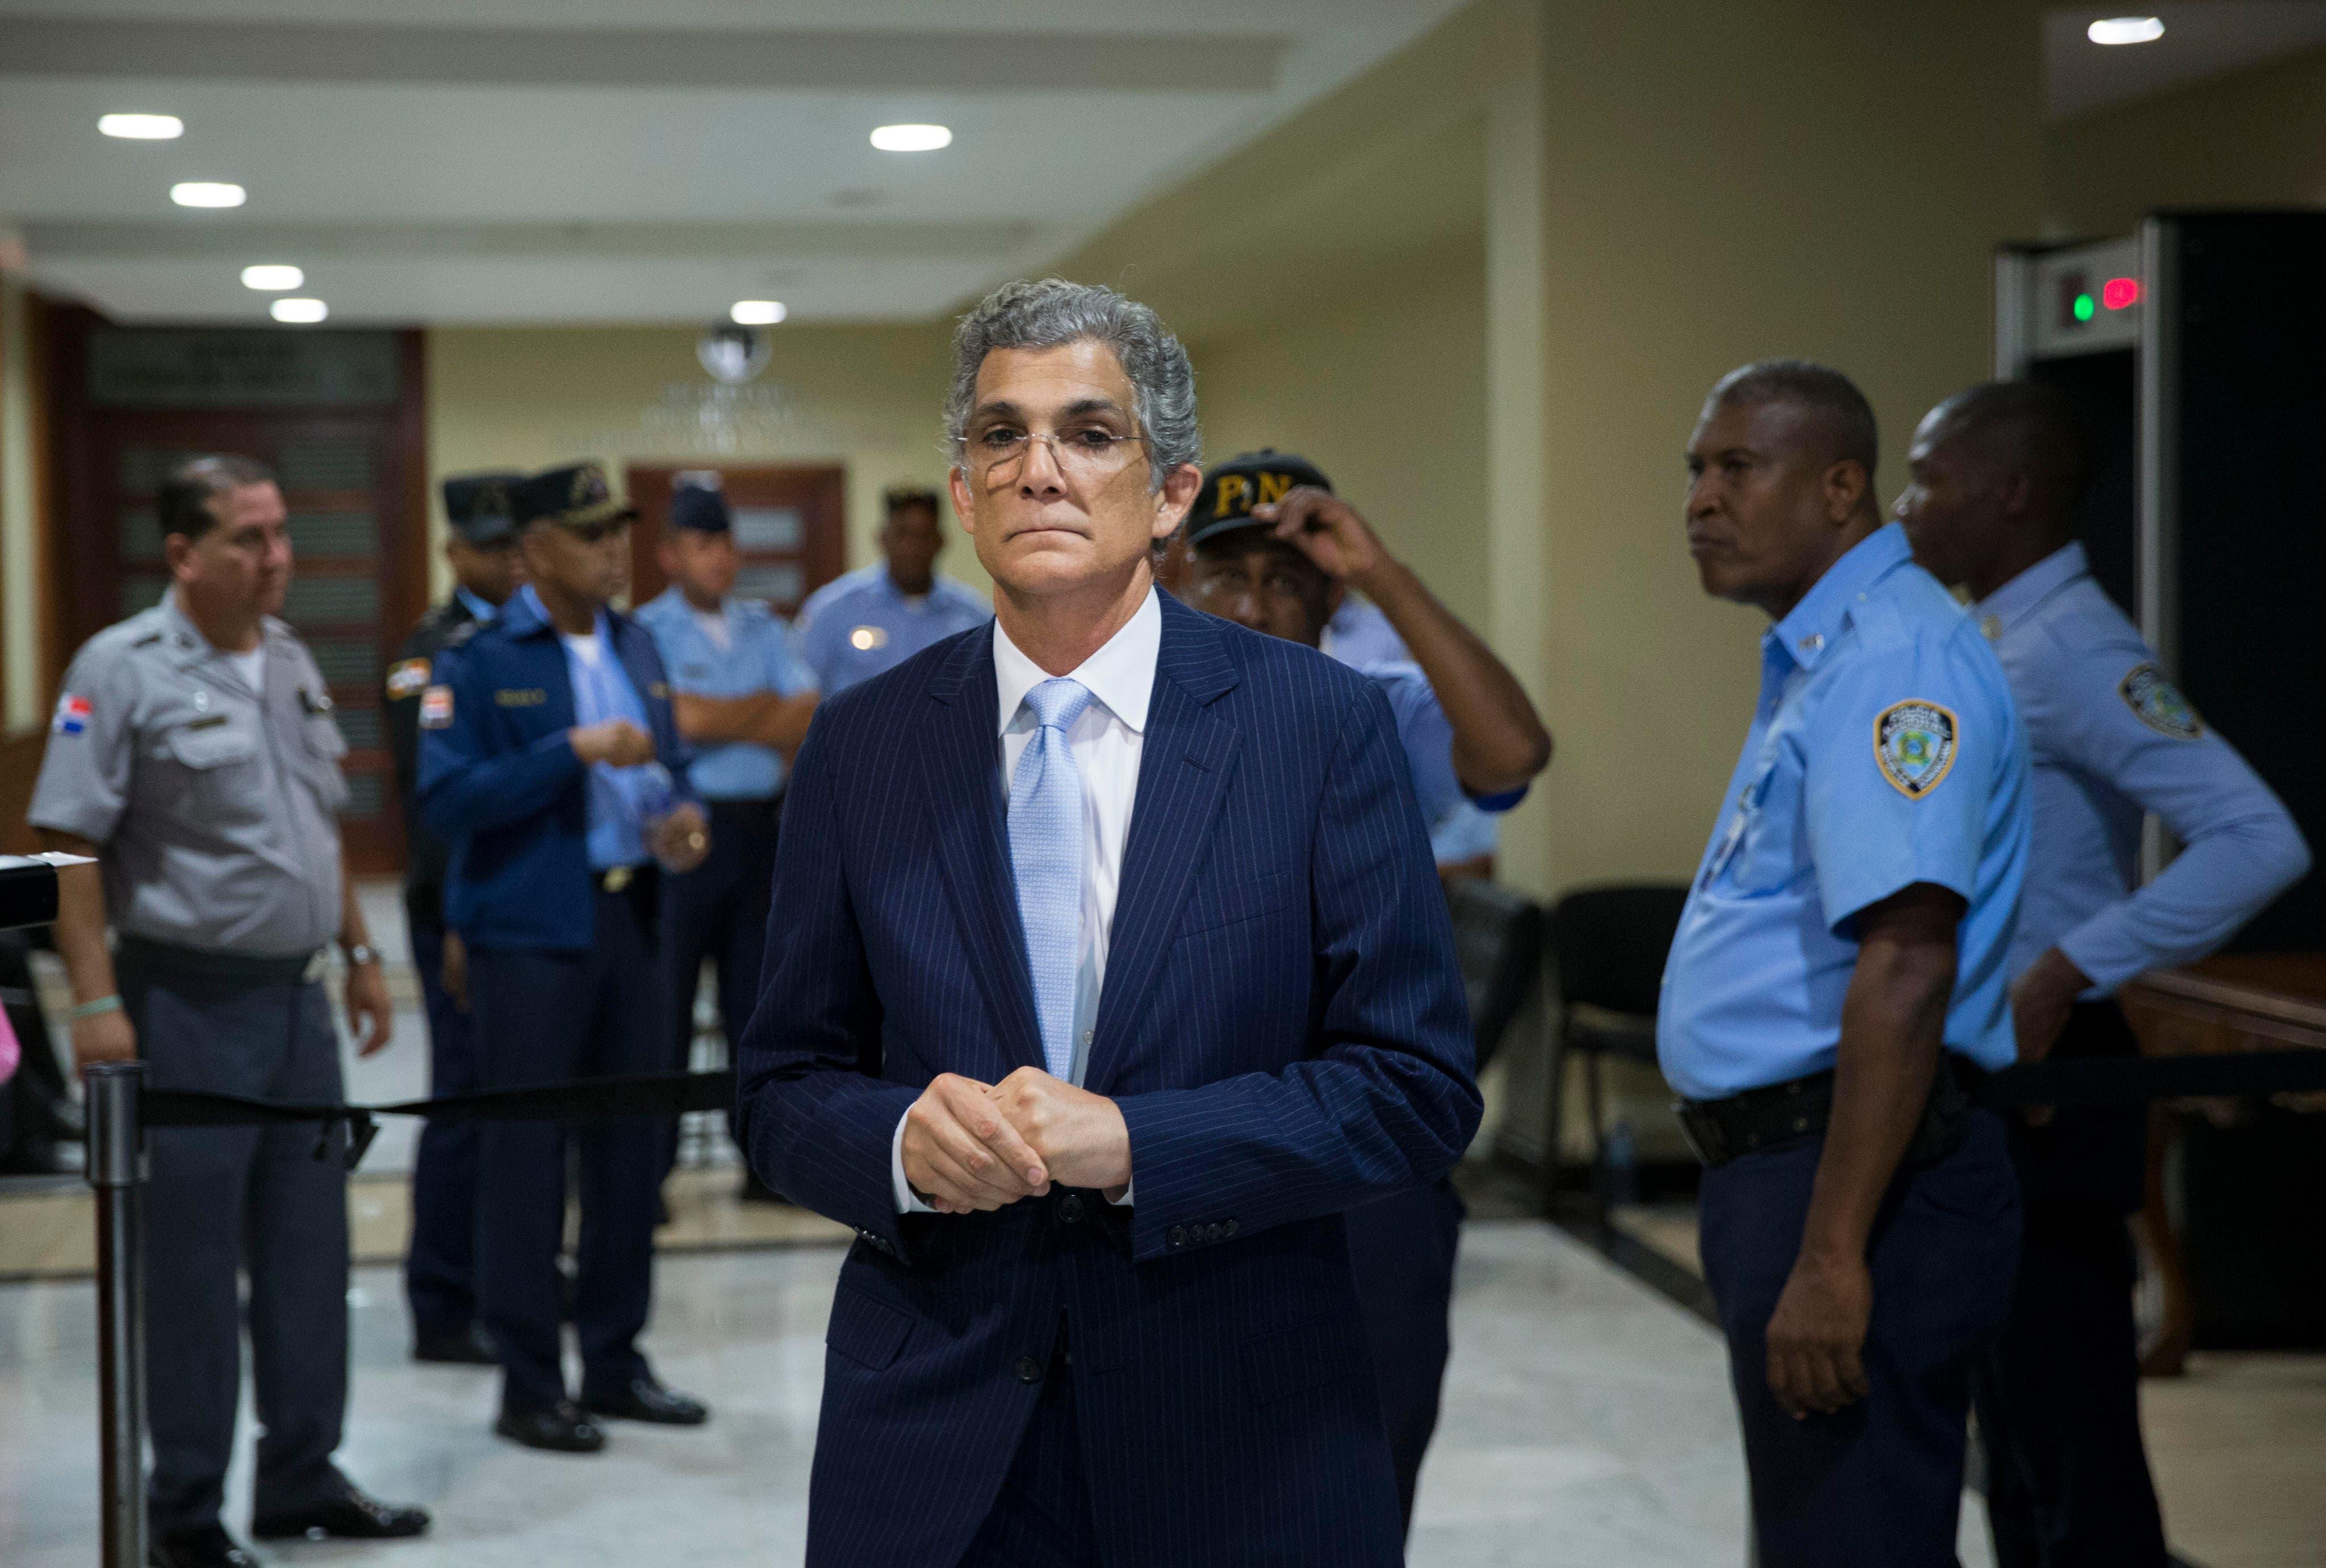 Defensa caso Odebrecht asegura Dantas Bezerra no demostró fondos recibió Pittaluga